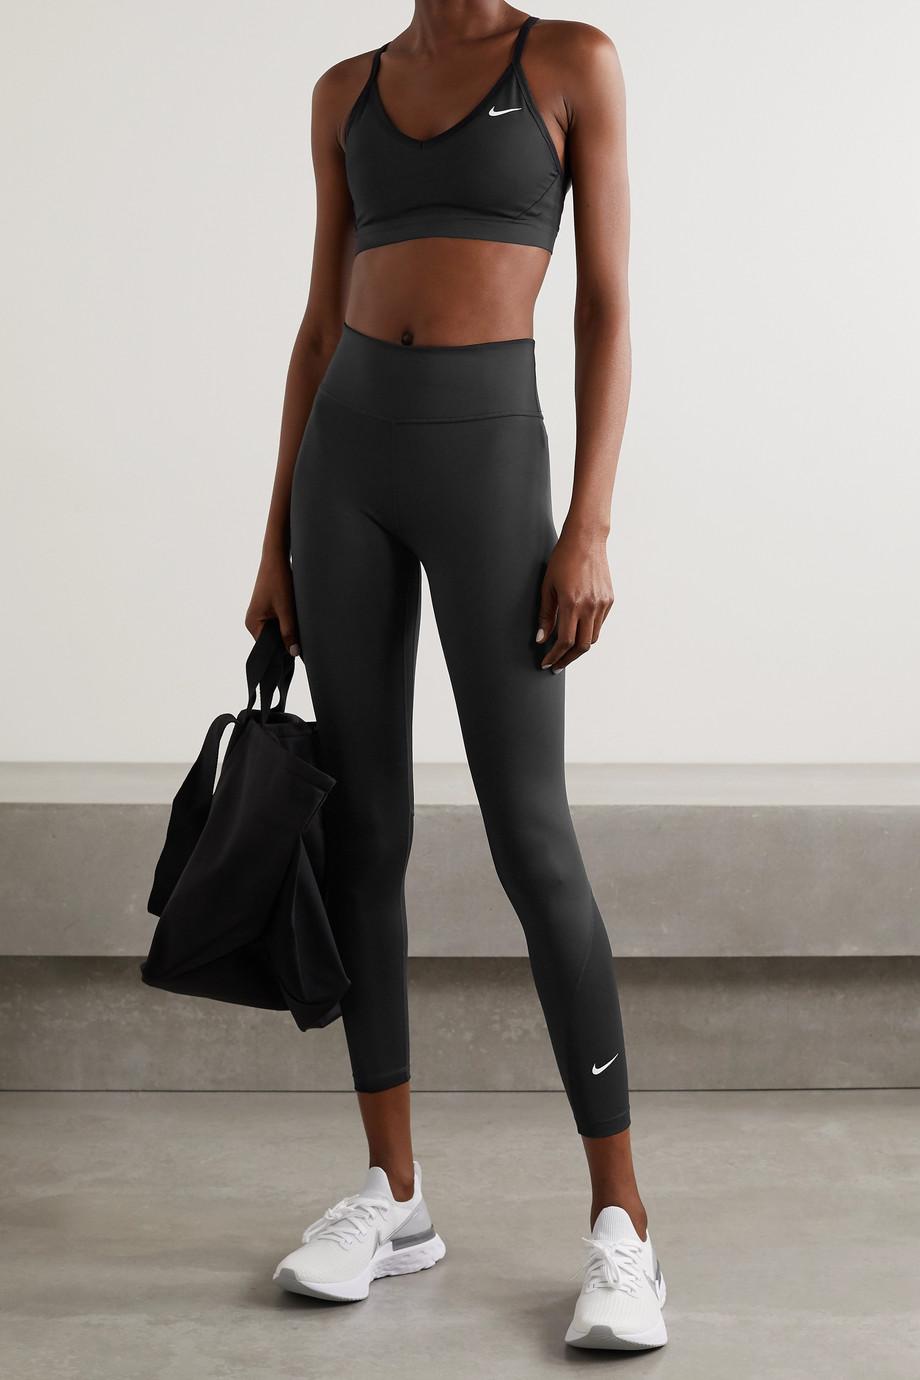 Nike One mesh-trimmed Dri-FIT leggings